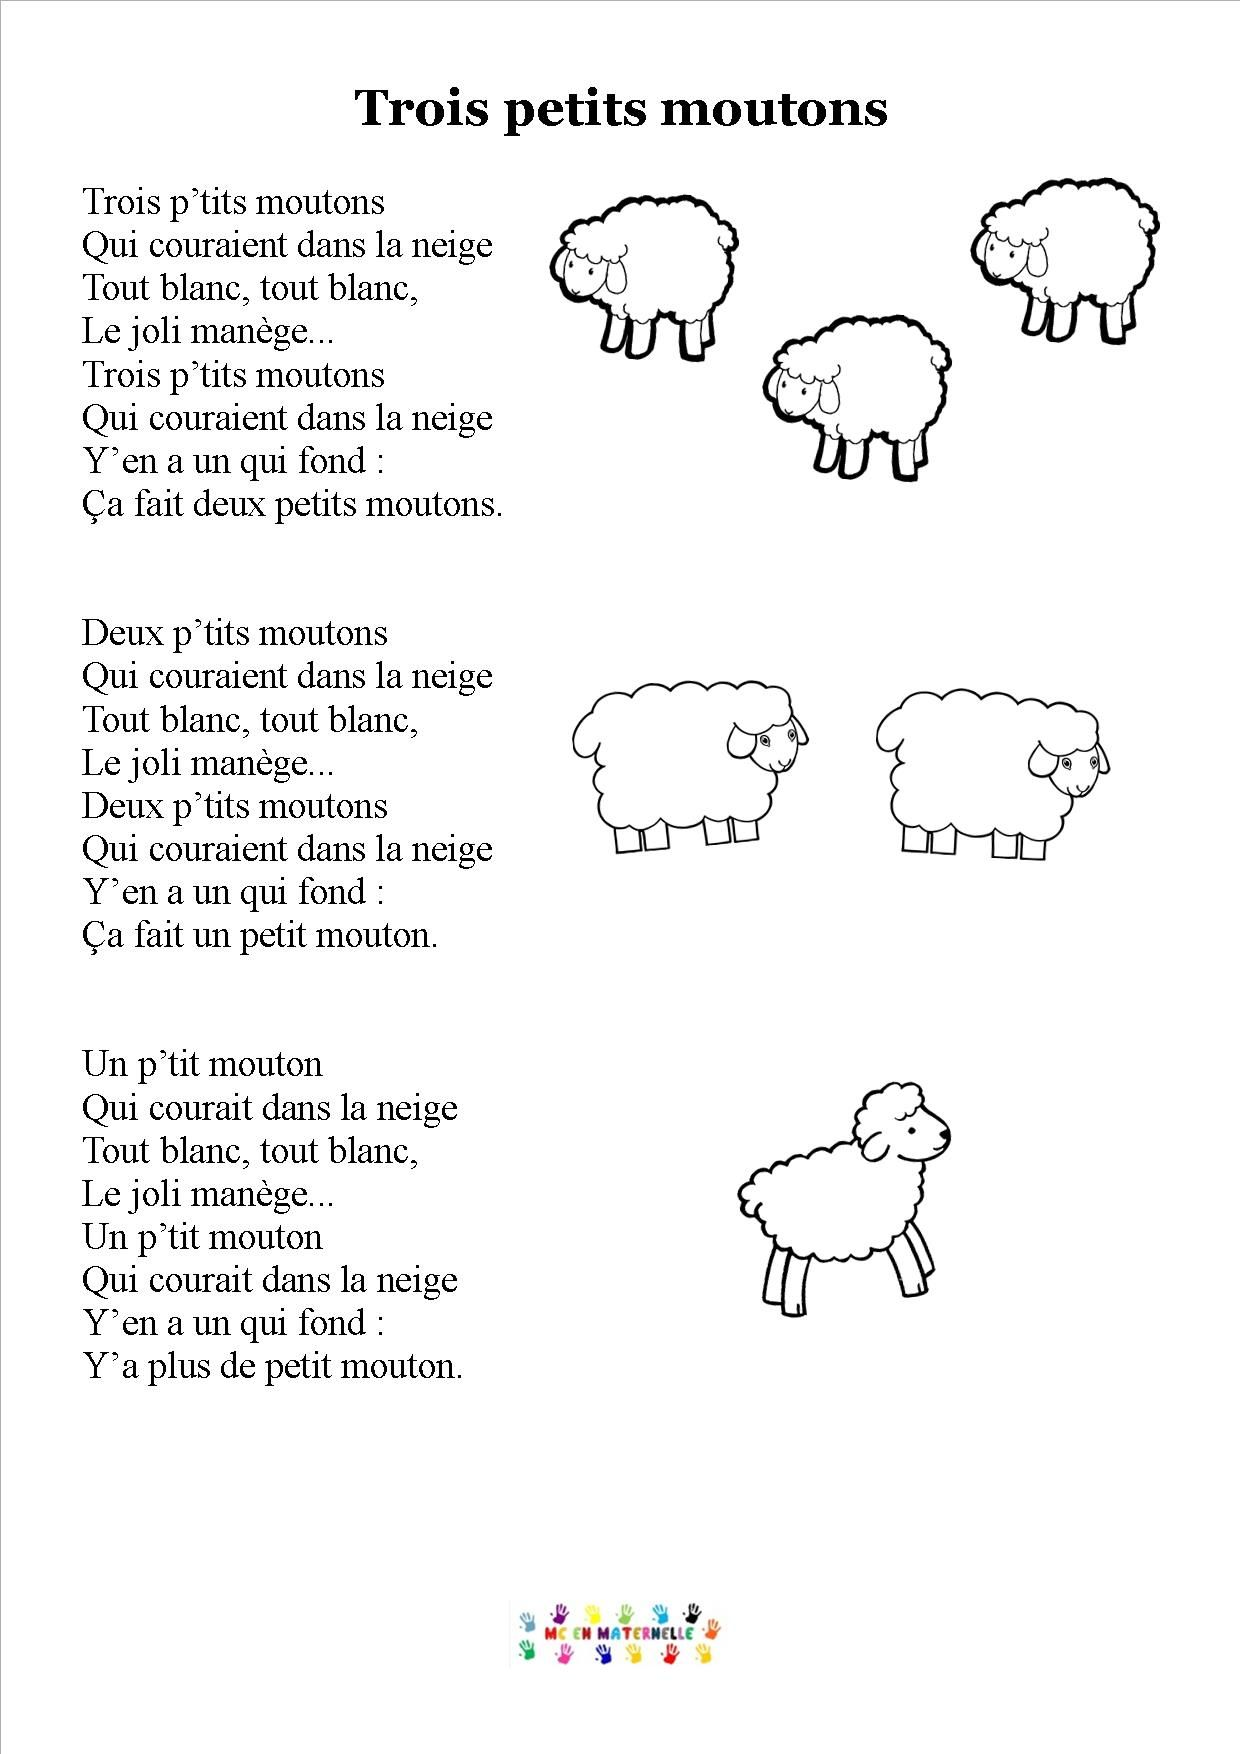 Trois Petits Moutons Chansons Comptines Comptines Et Comptines